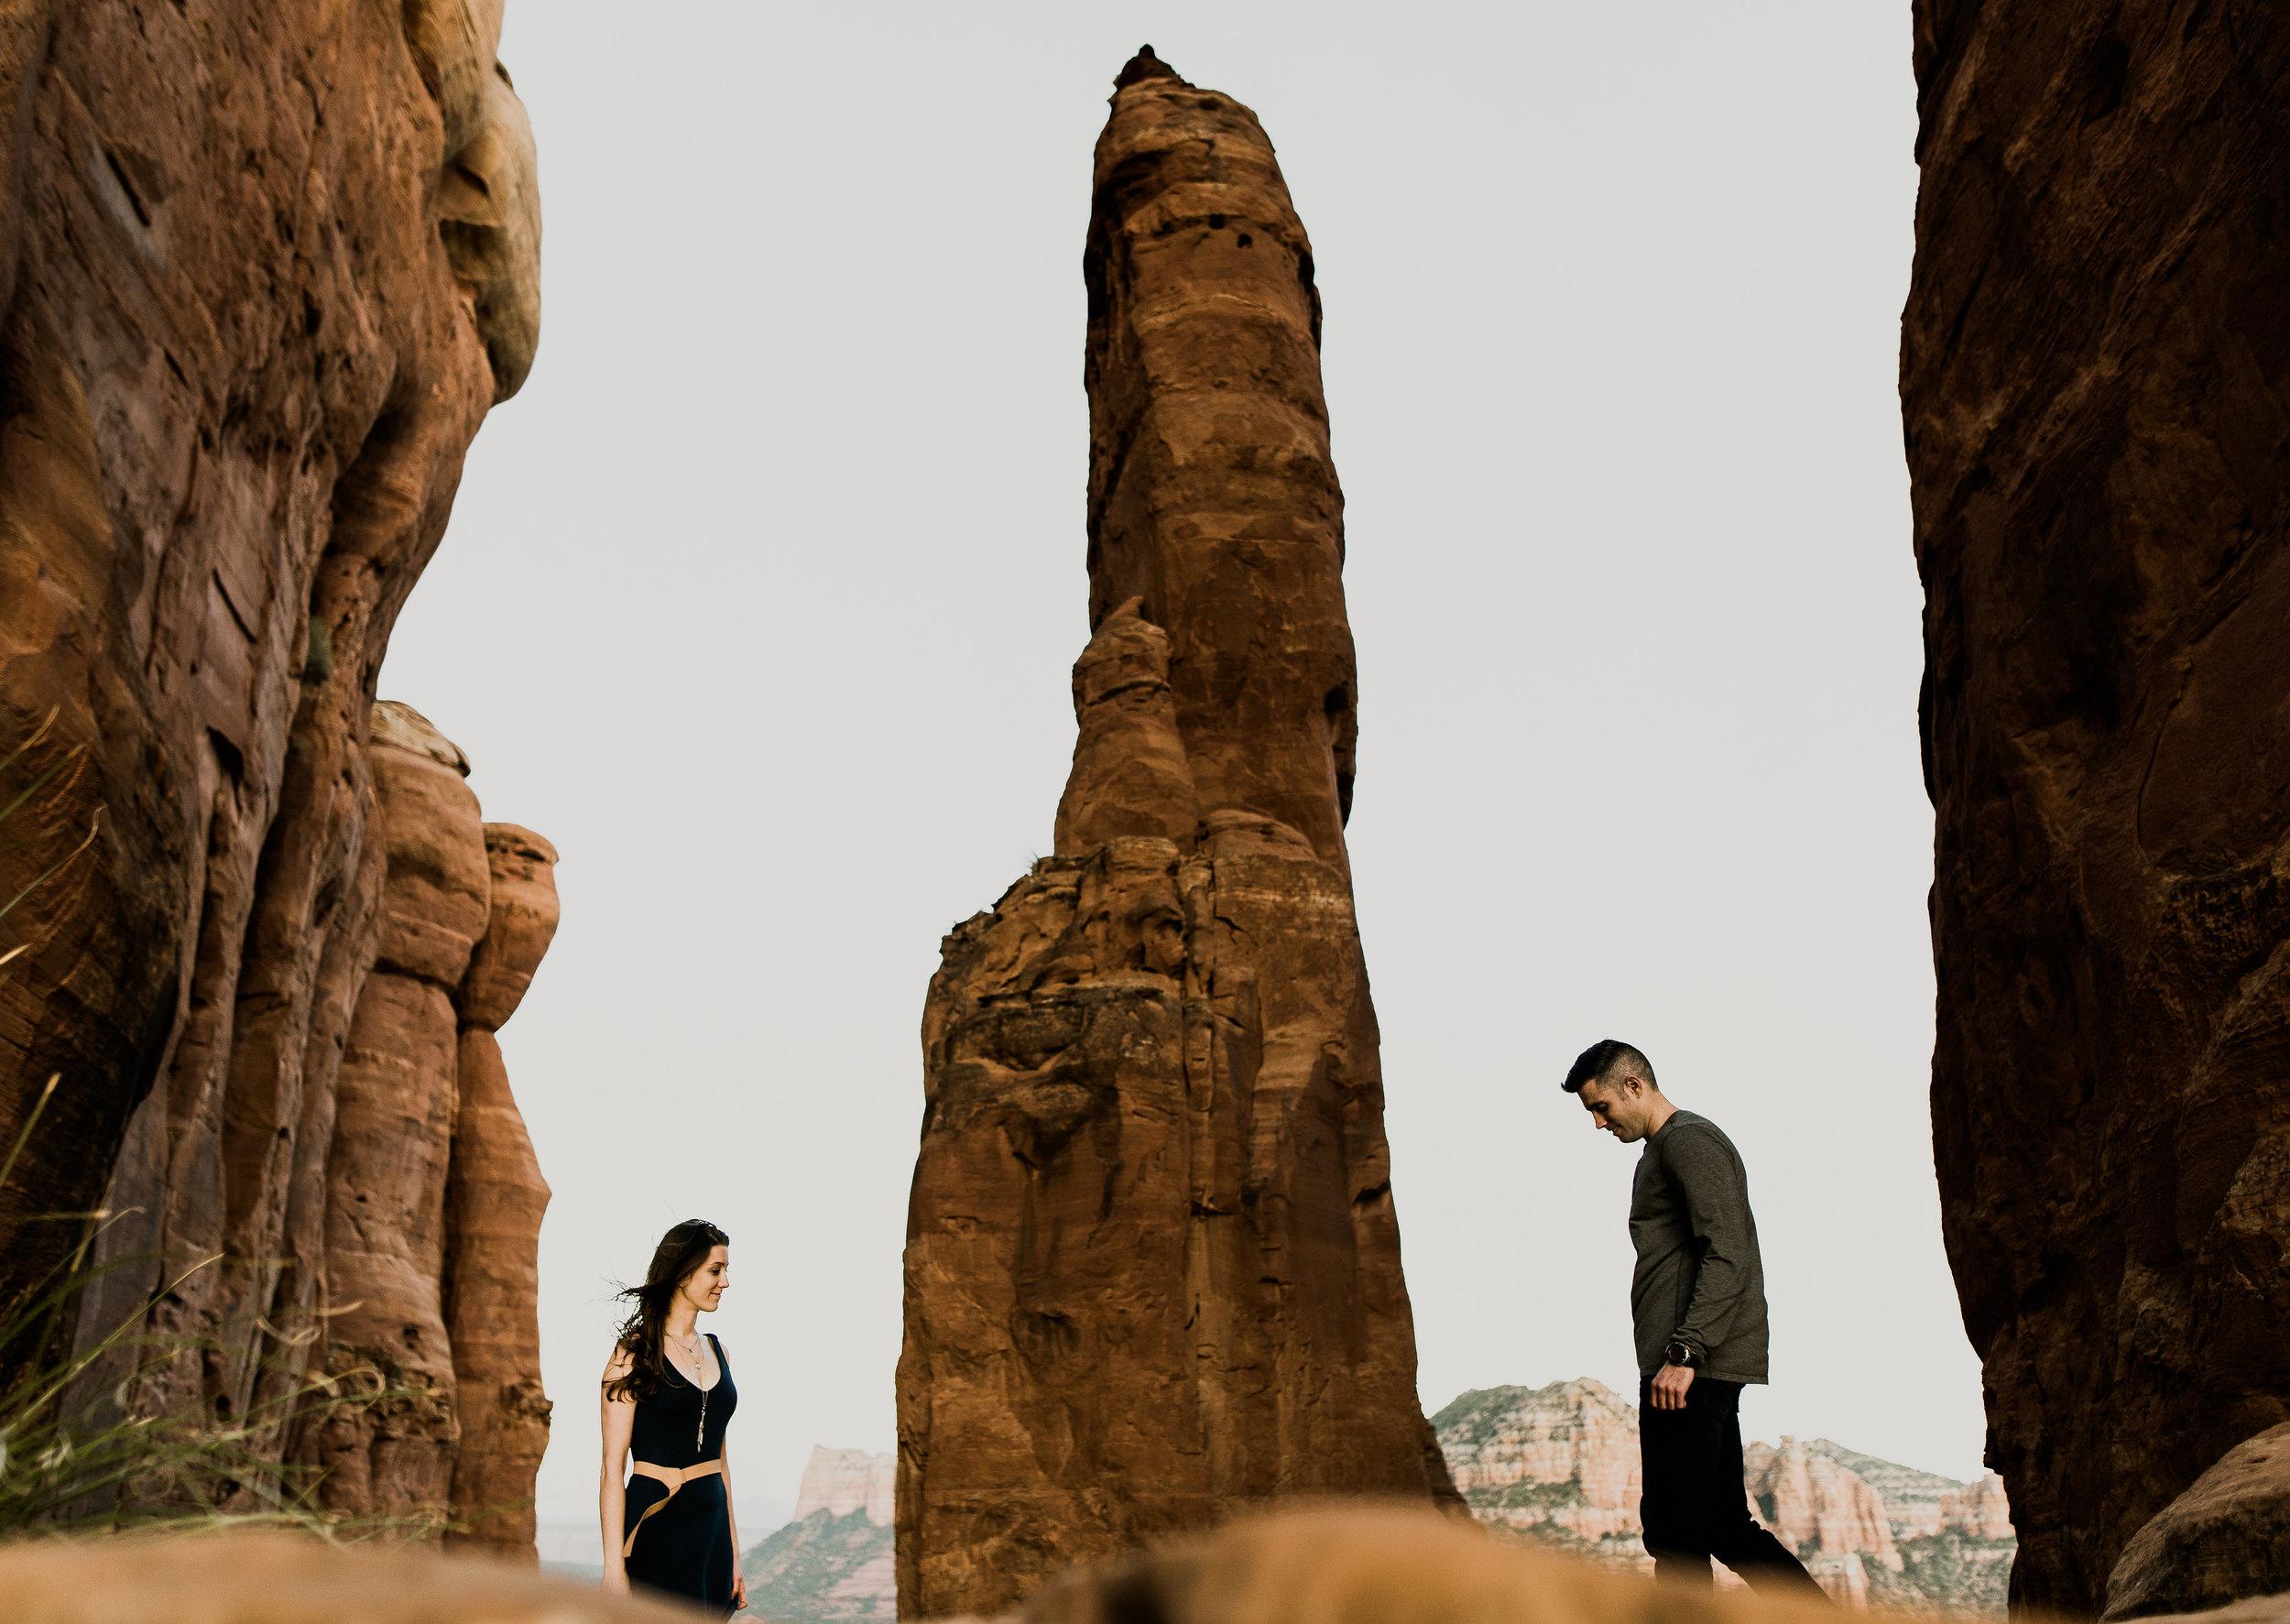 Isaiah-&-Taylor-Photography---Paul-&-Karen-Engagement,-Sedona-Arizona-191.jpg